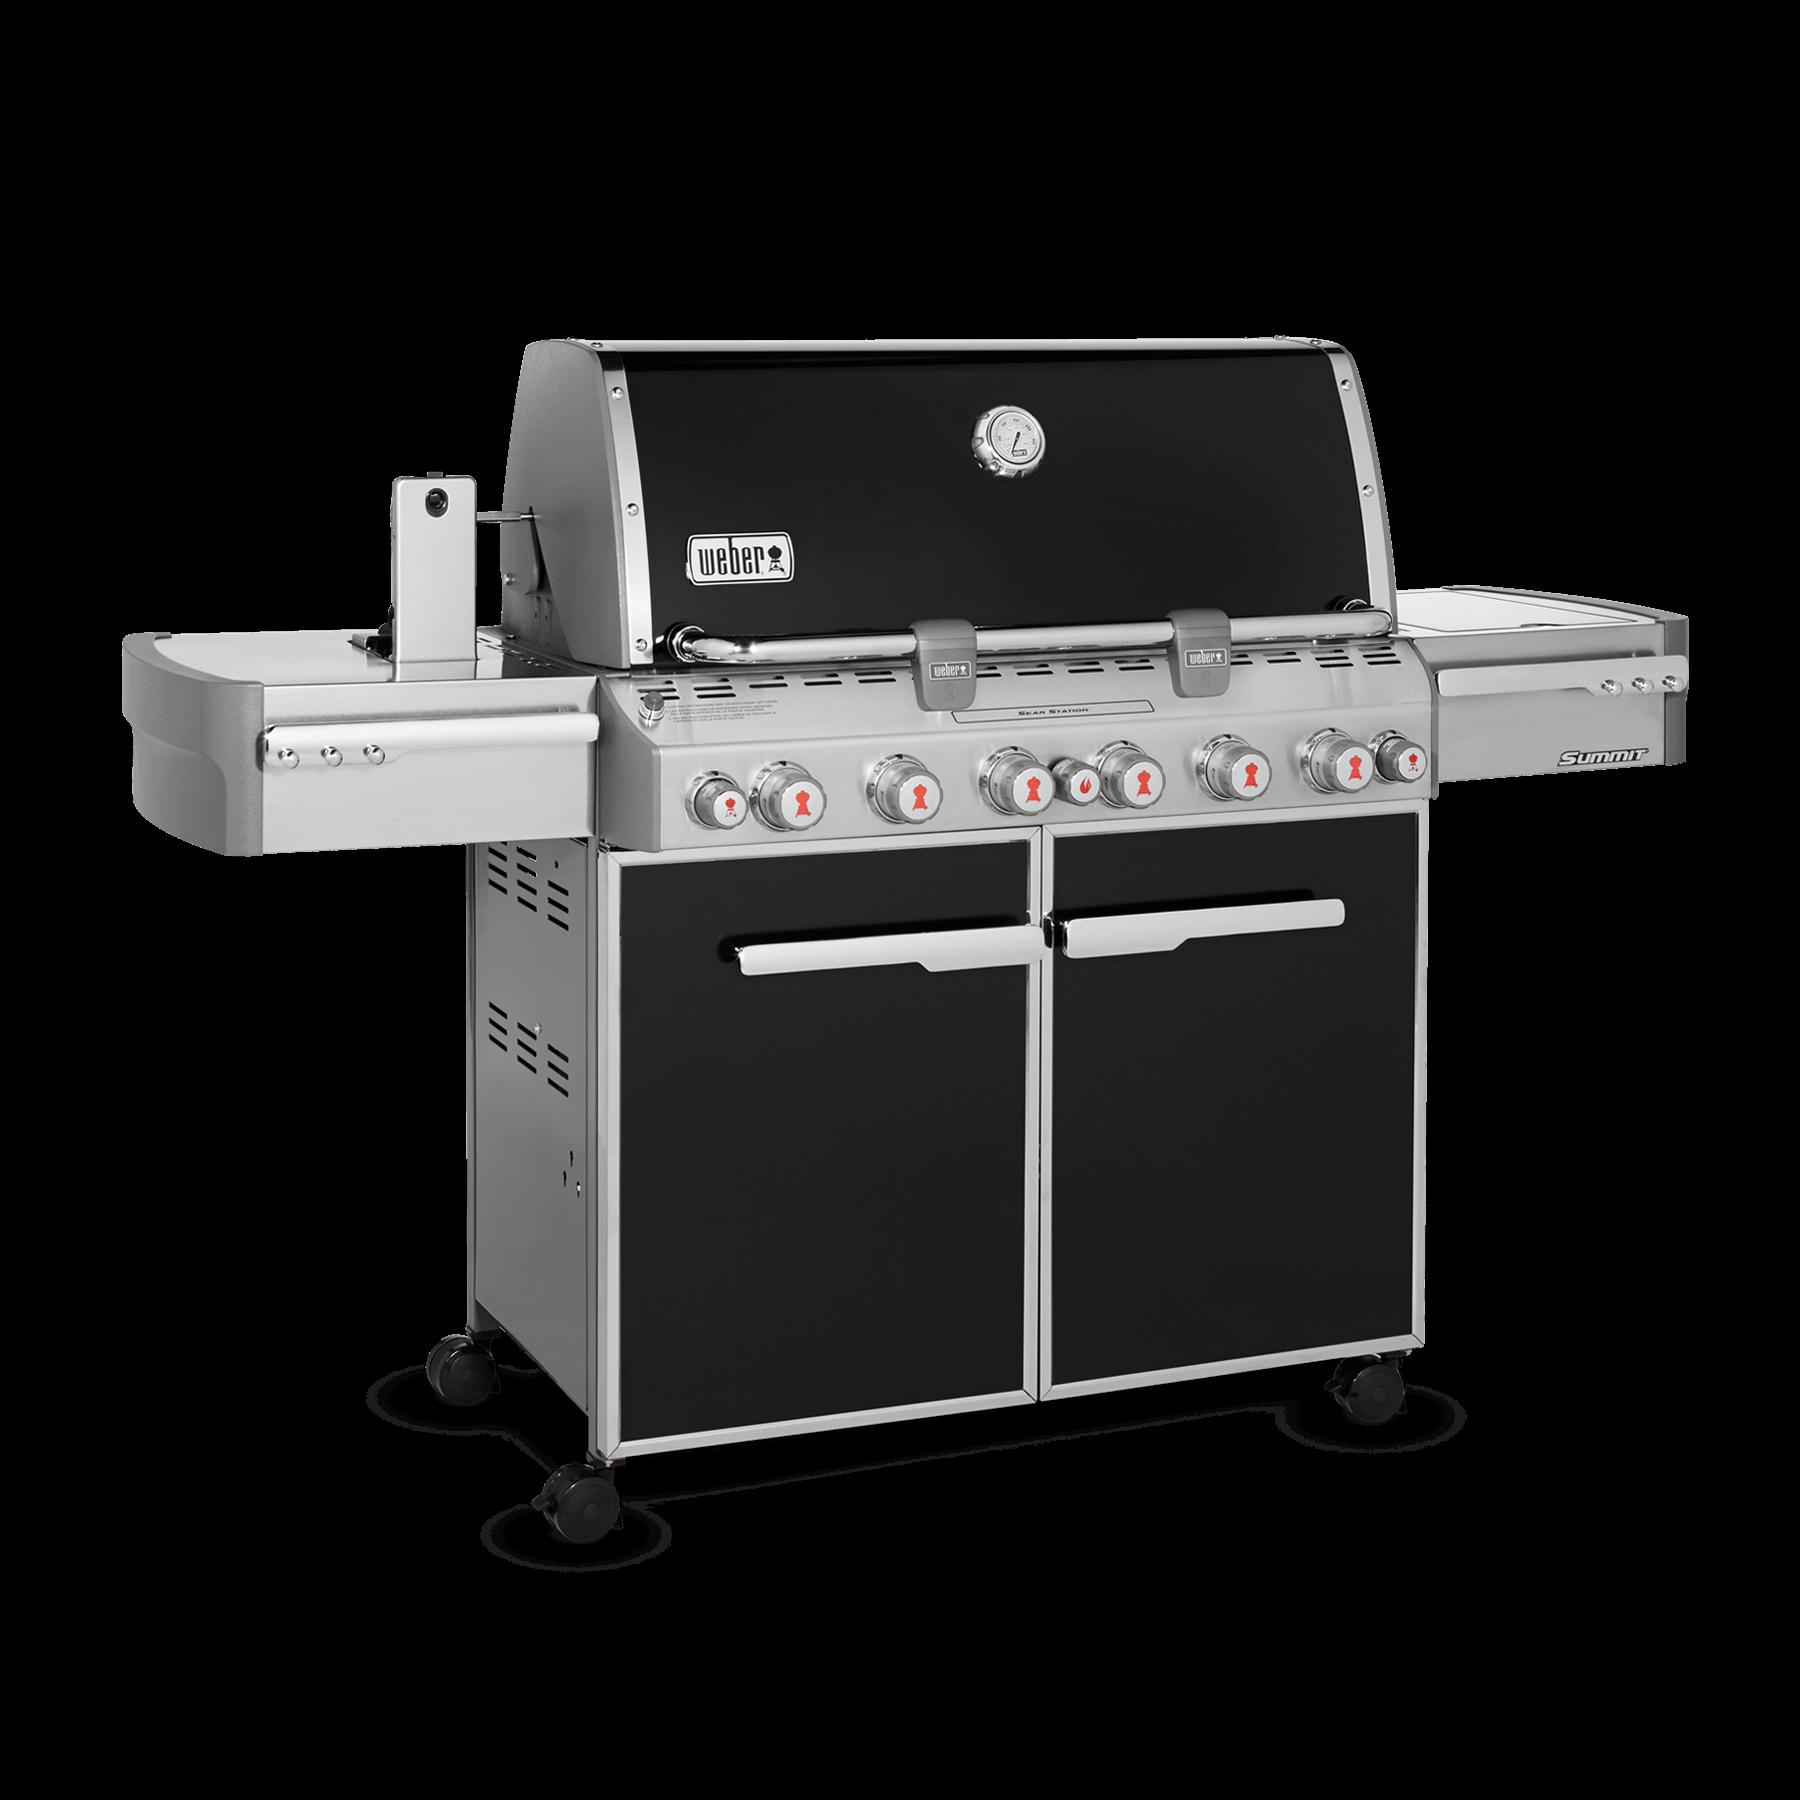 Summit® E-670 GBS Gasbarbecue